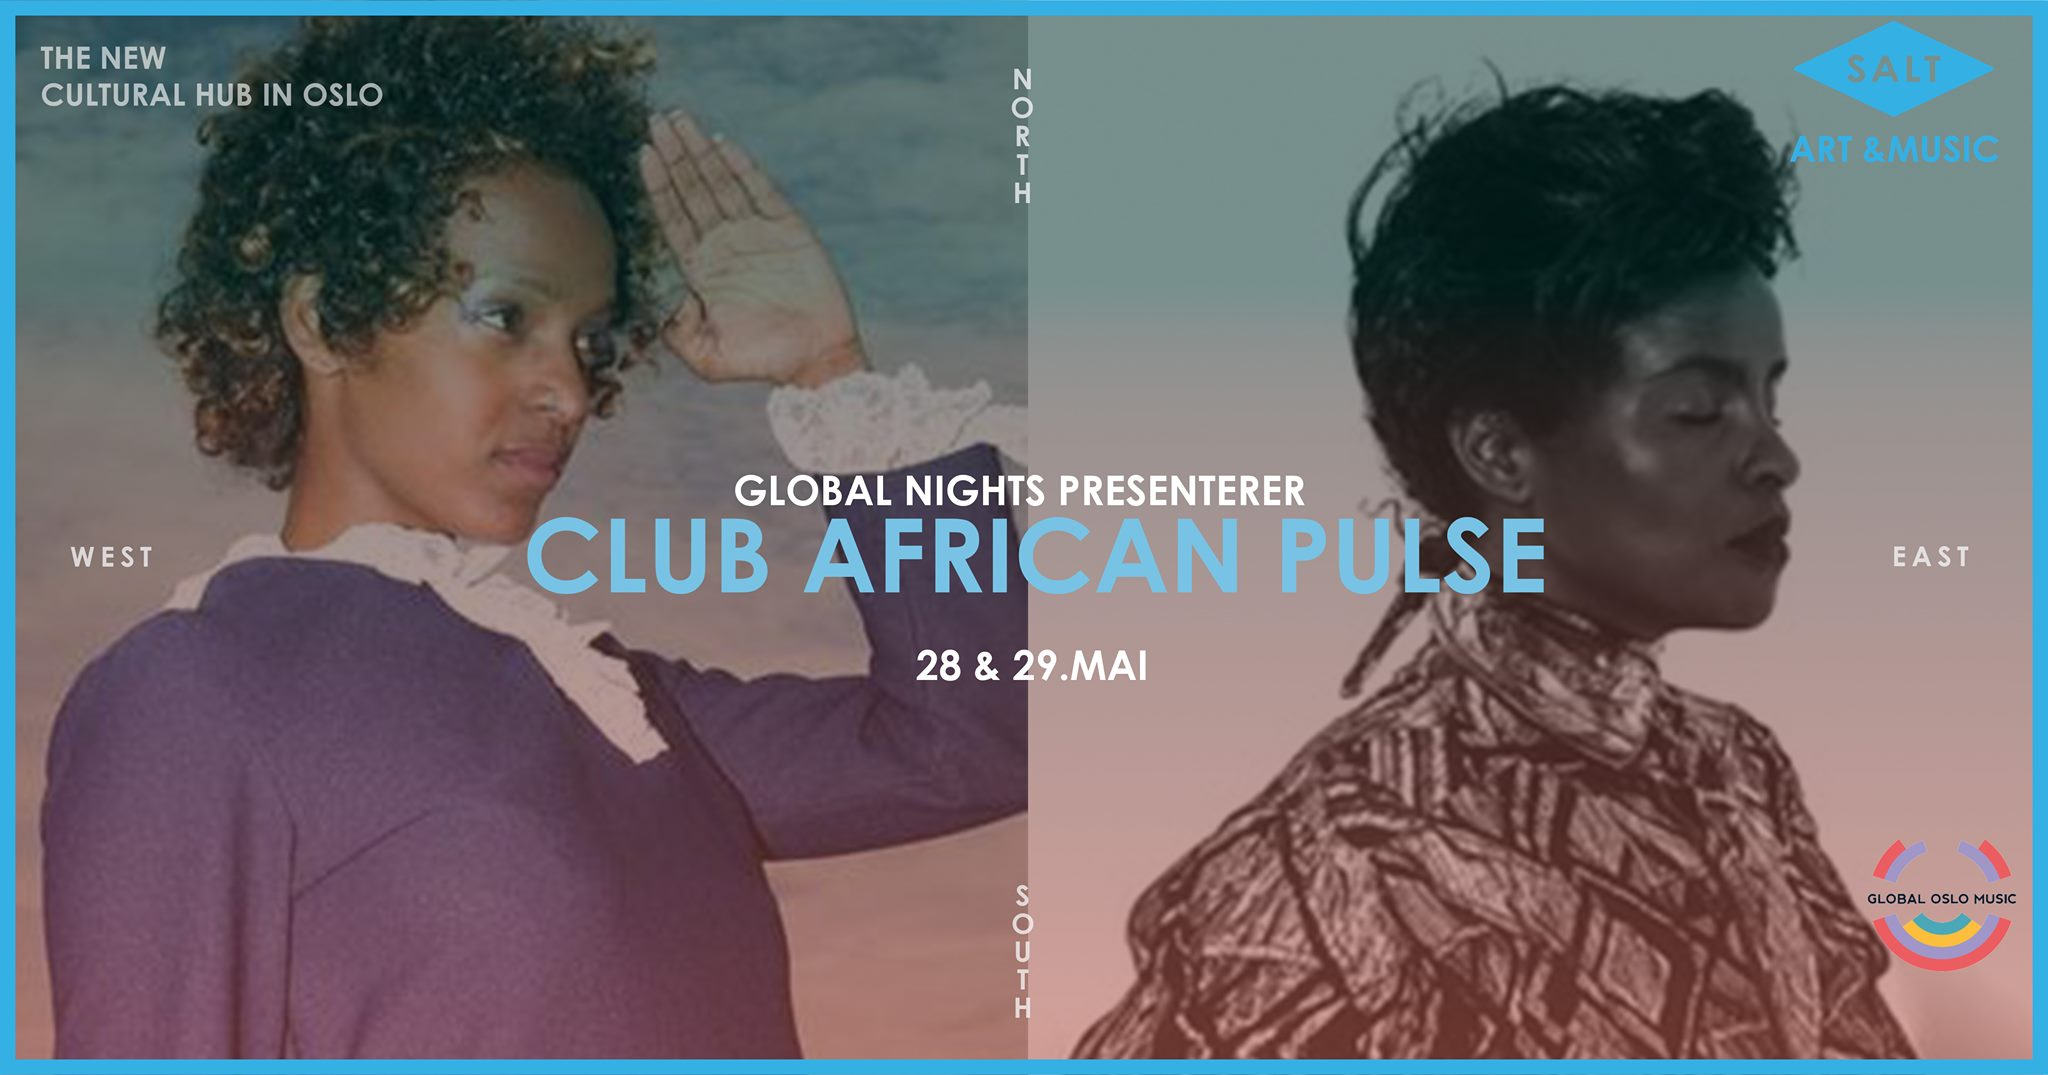 Club African Pulse